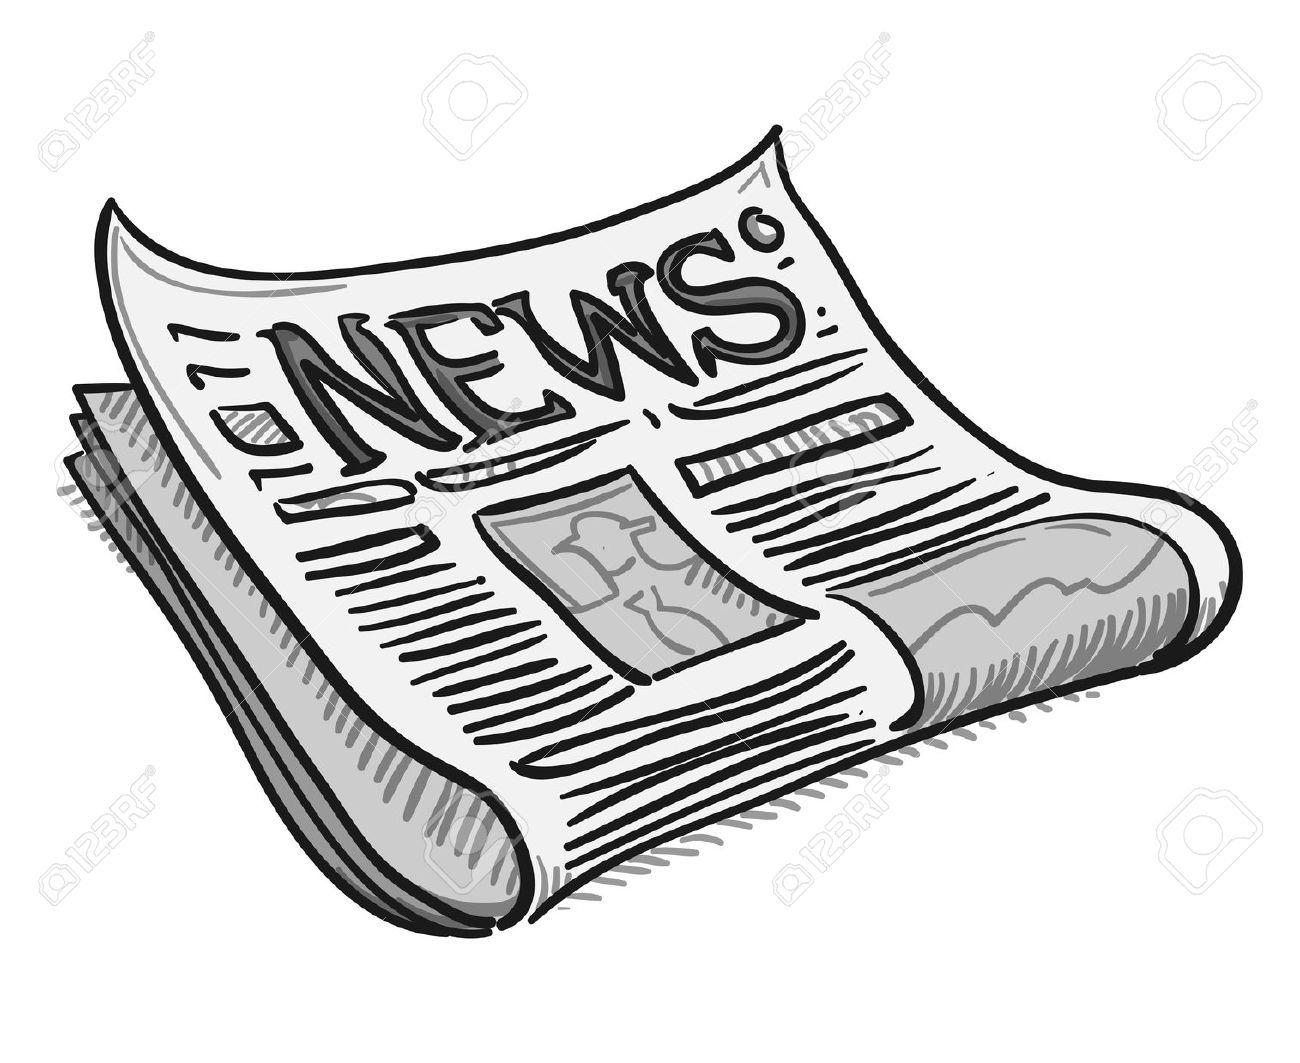 Newspaper article clipart 4 » Clipart Portal.